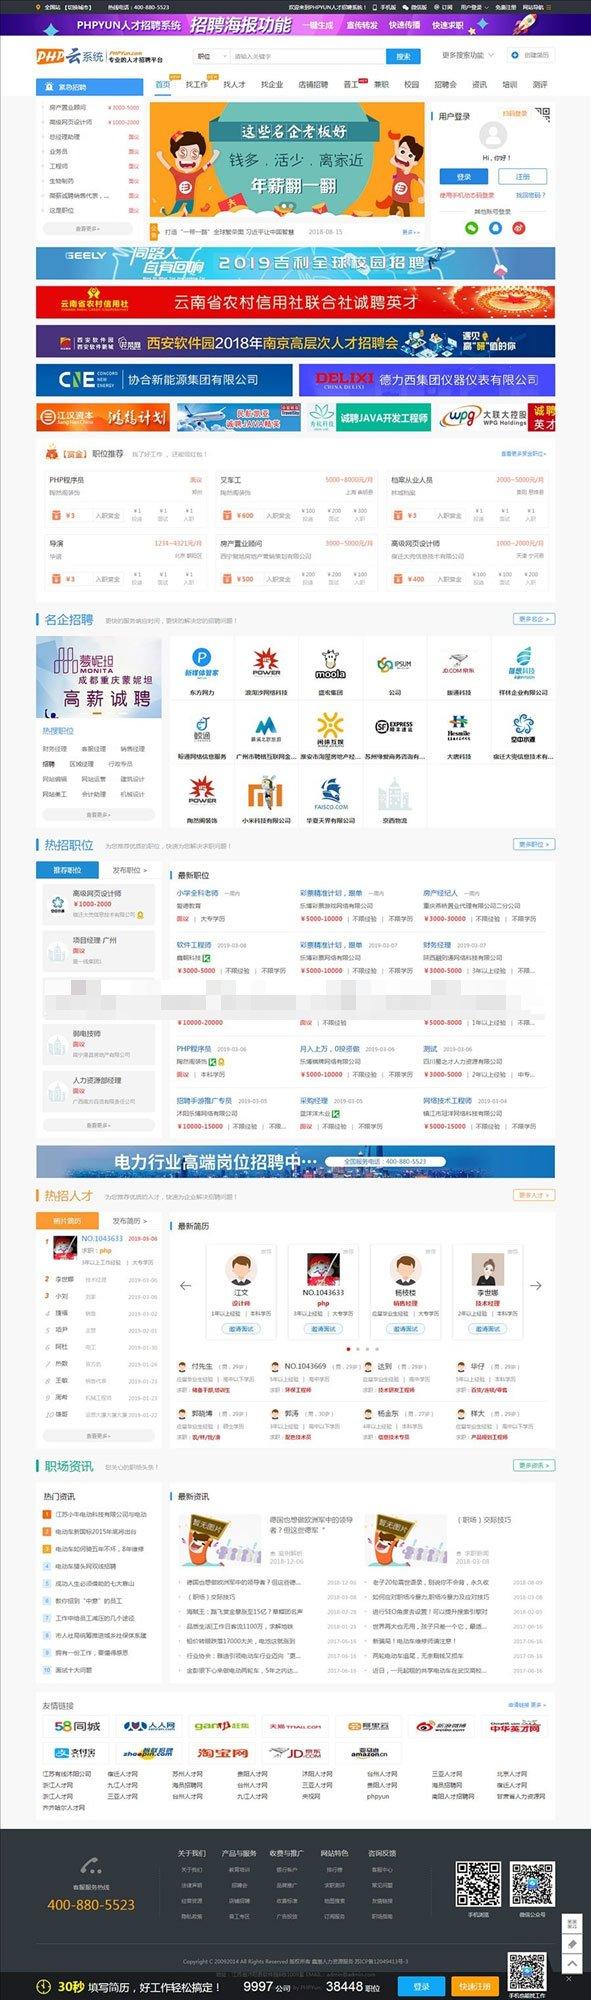 PHPYUN人才招聘系统网站源码V4.6 VIP版下载